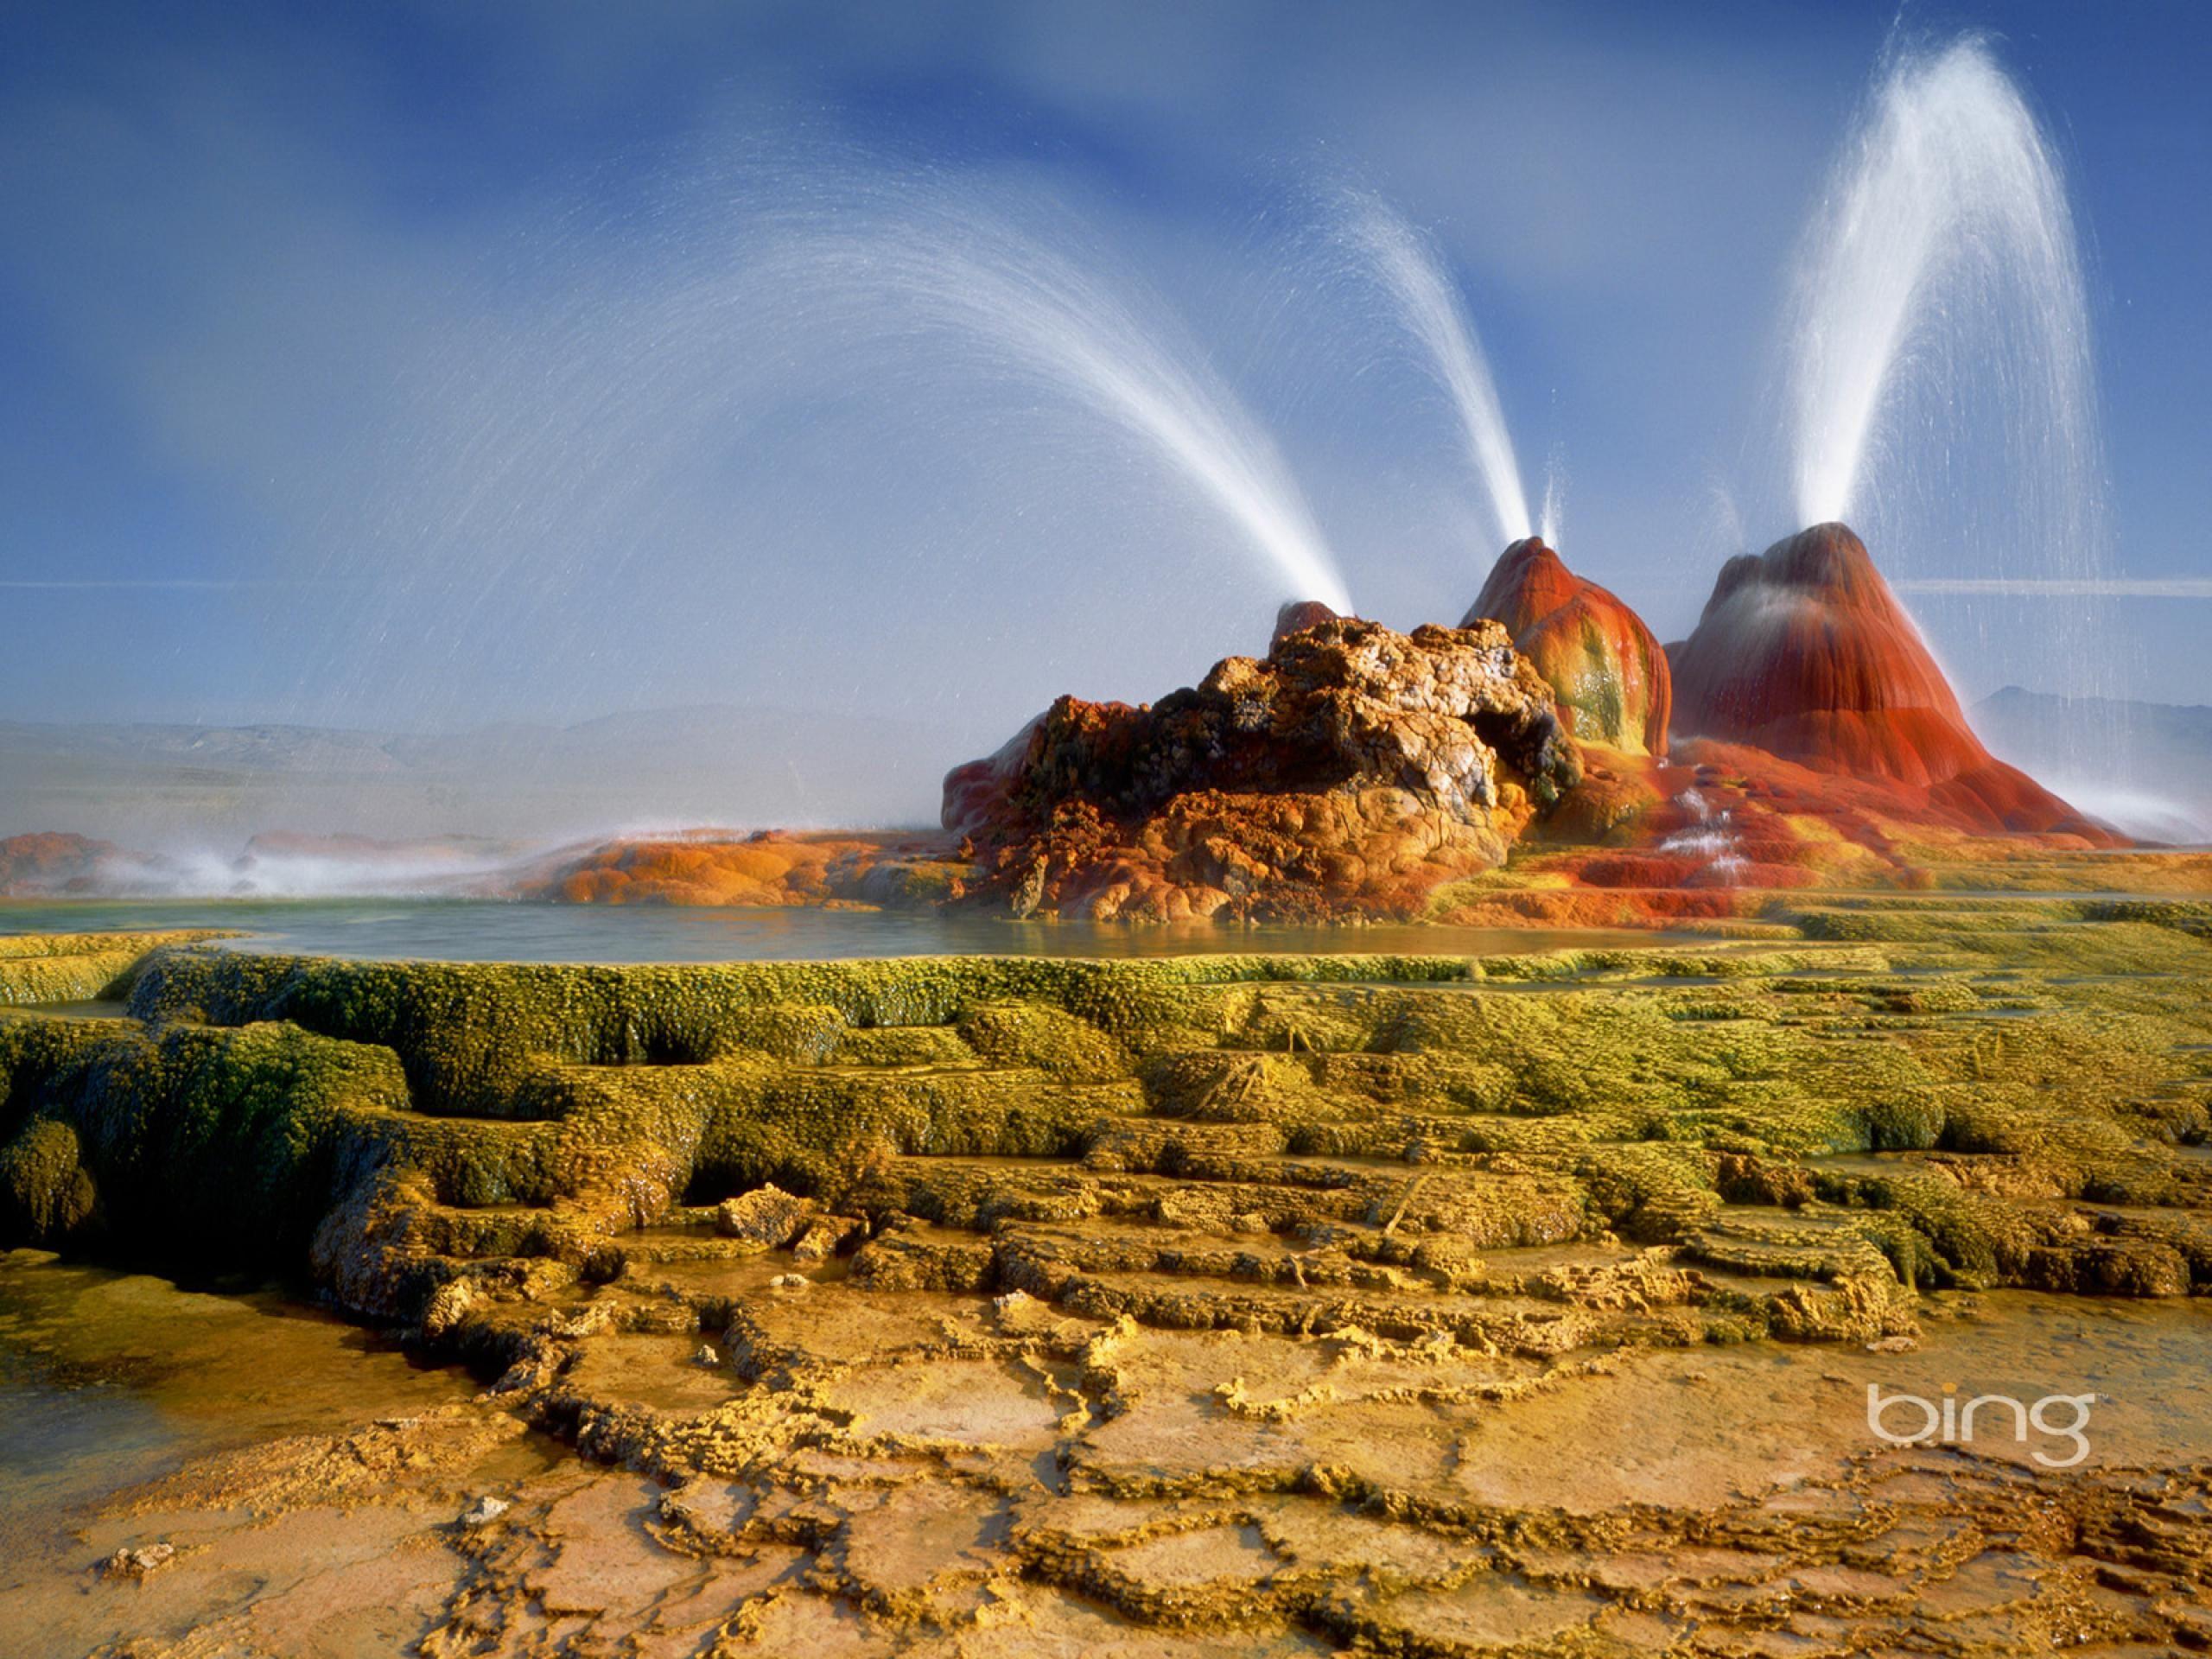 Wallpapers Desert Bing Microsoft Windows Theme Free Travel 2560x1920 Black Rock Desert Places To See Geyser